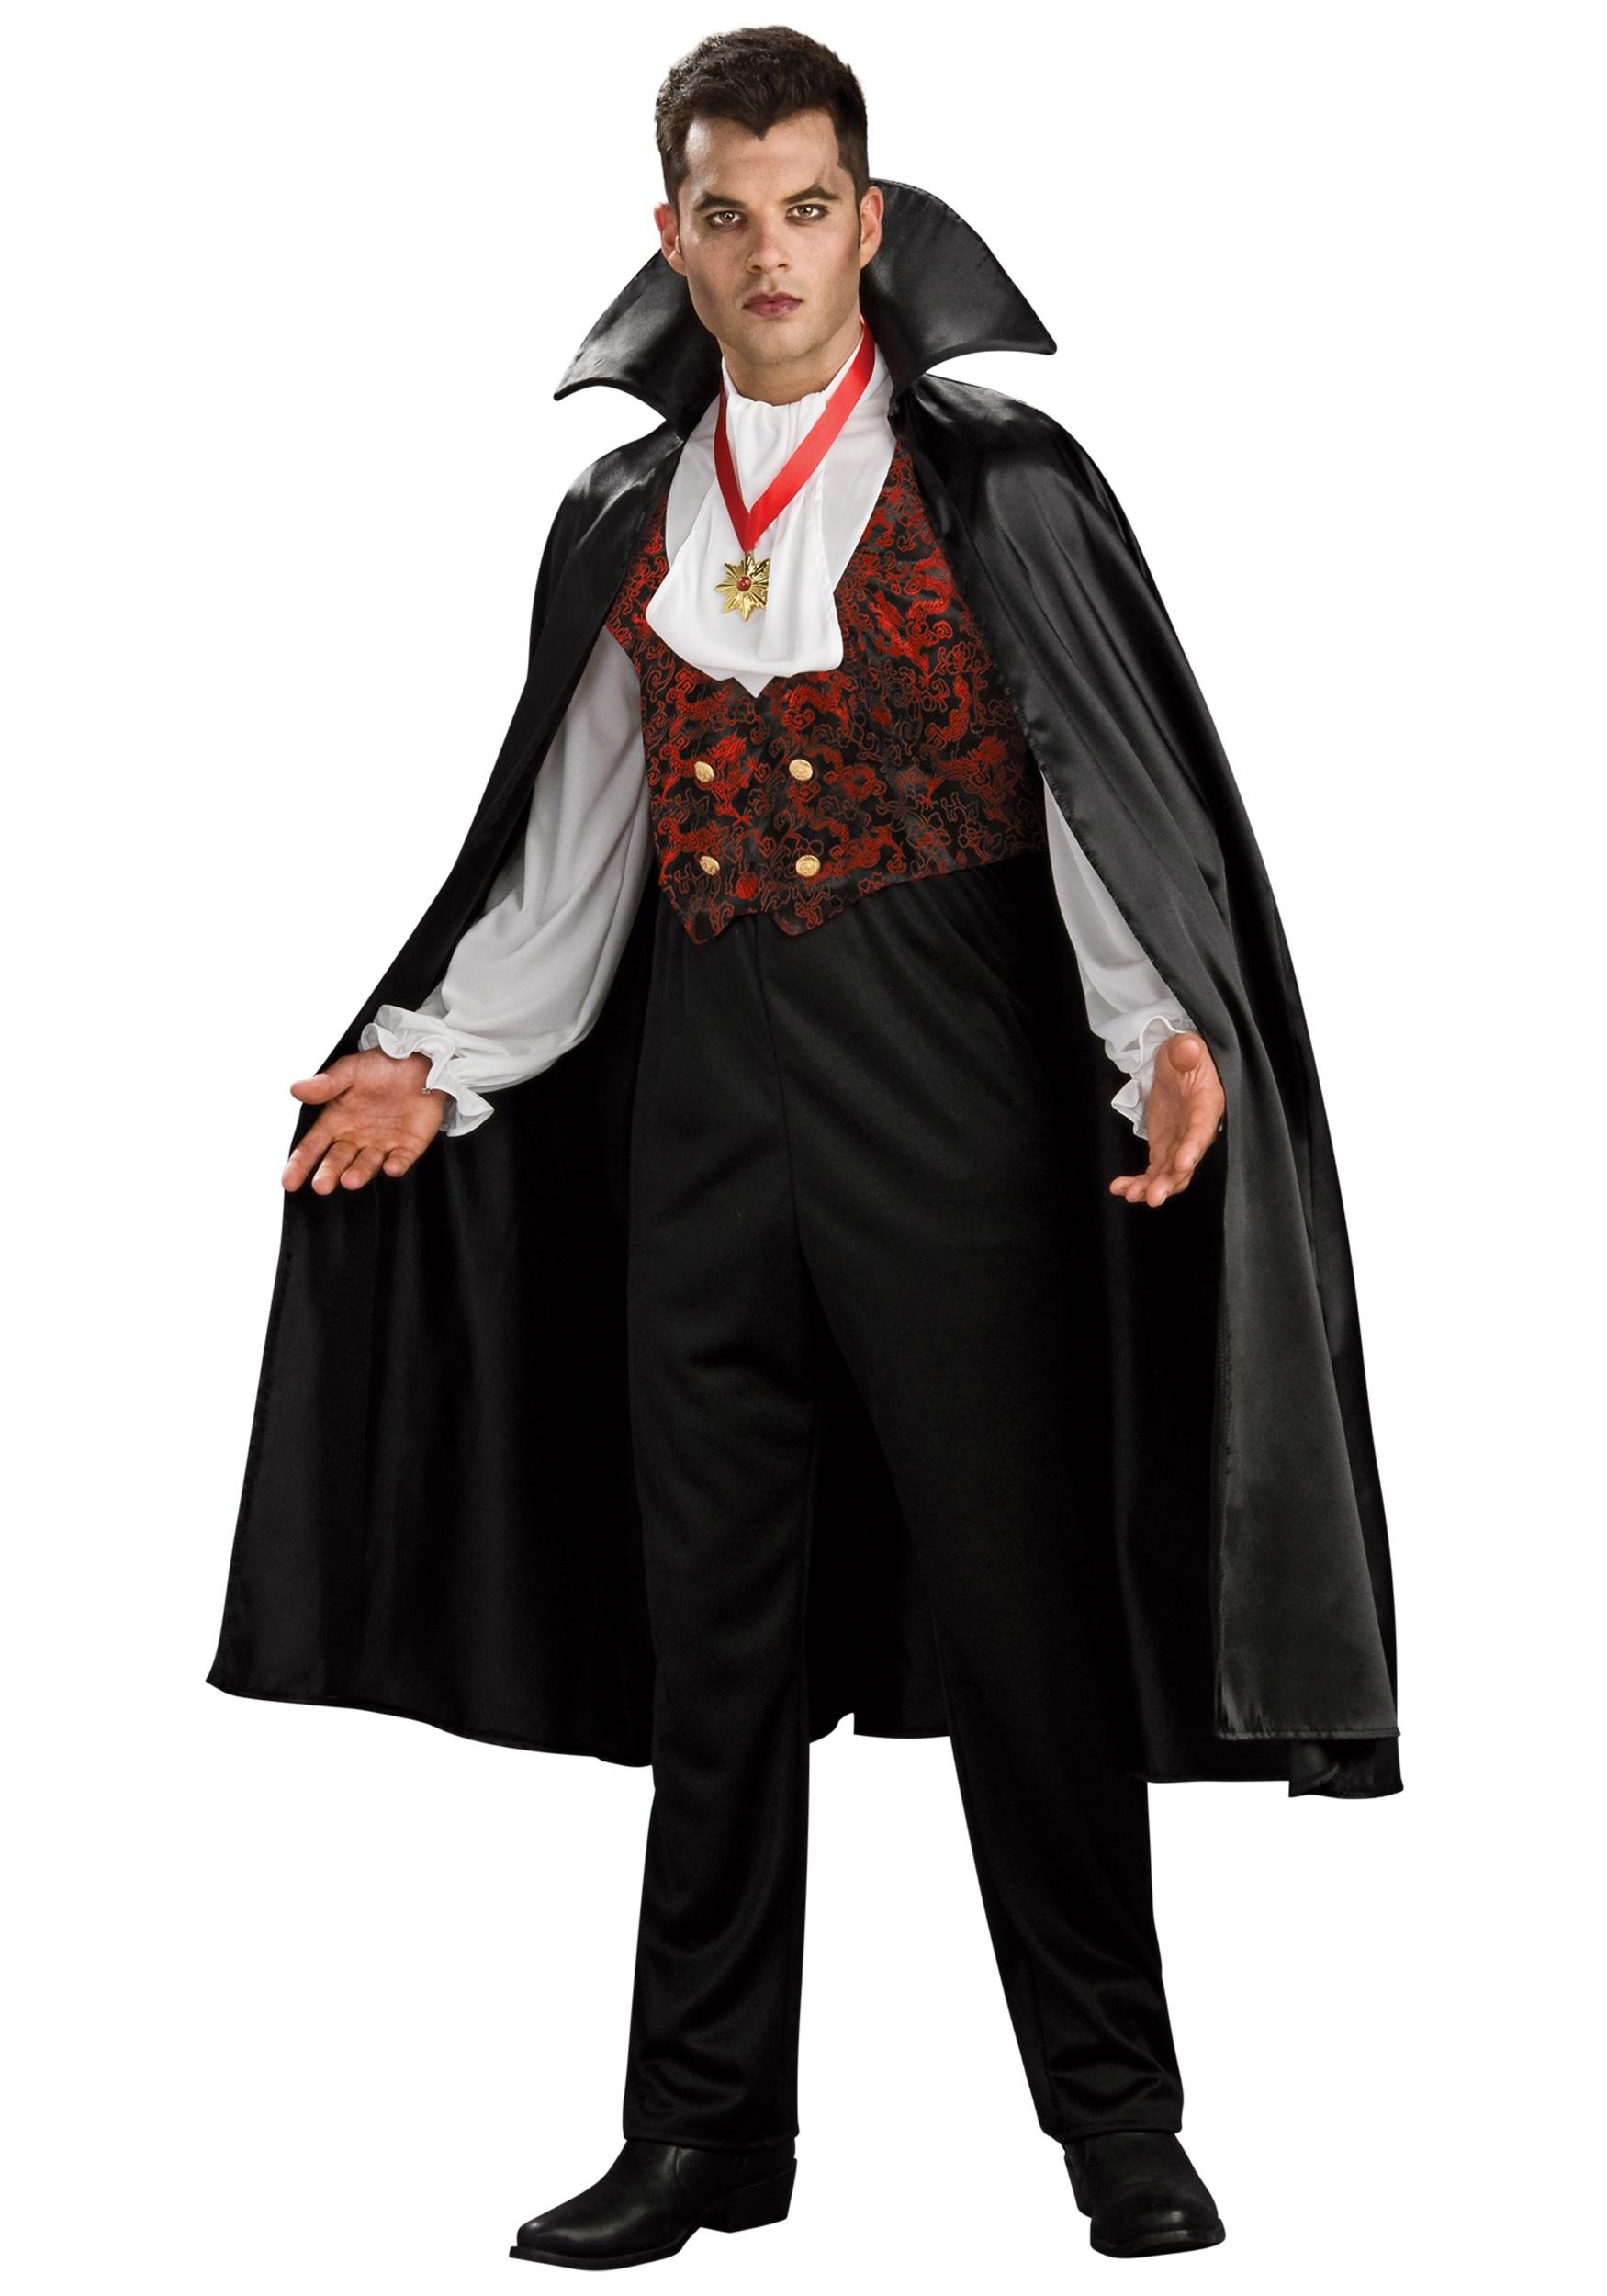 Dracula clipart halloween vampire costume Halloween vampire Halloween costumes